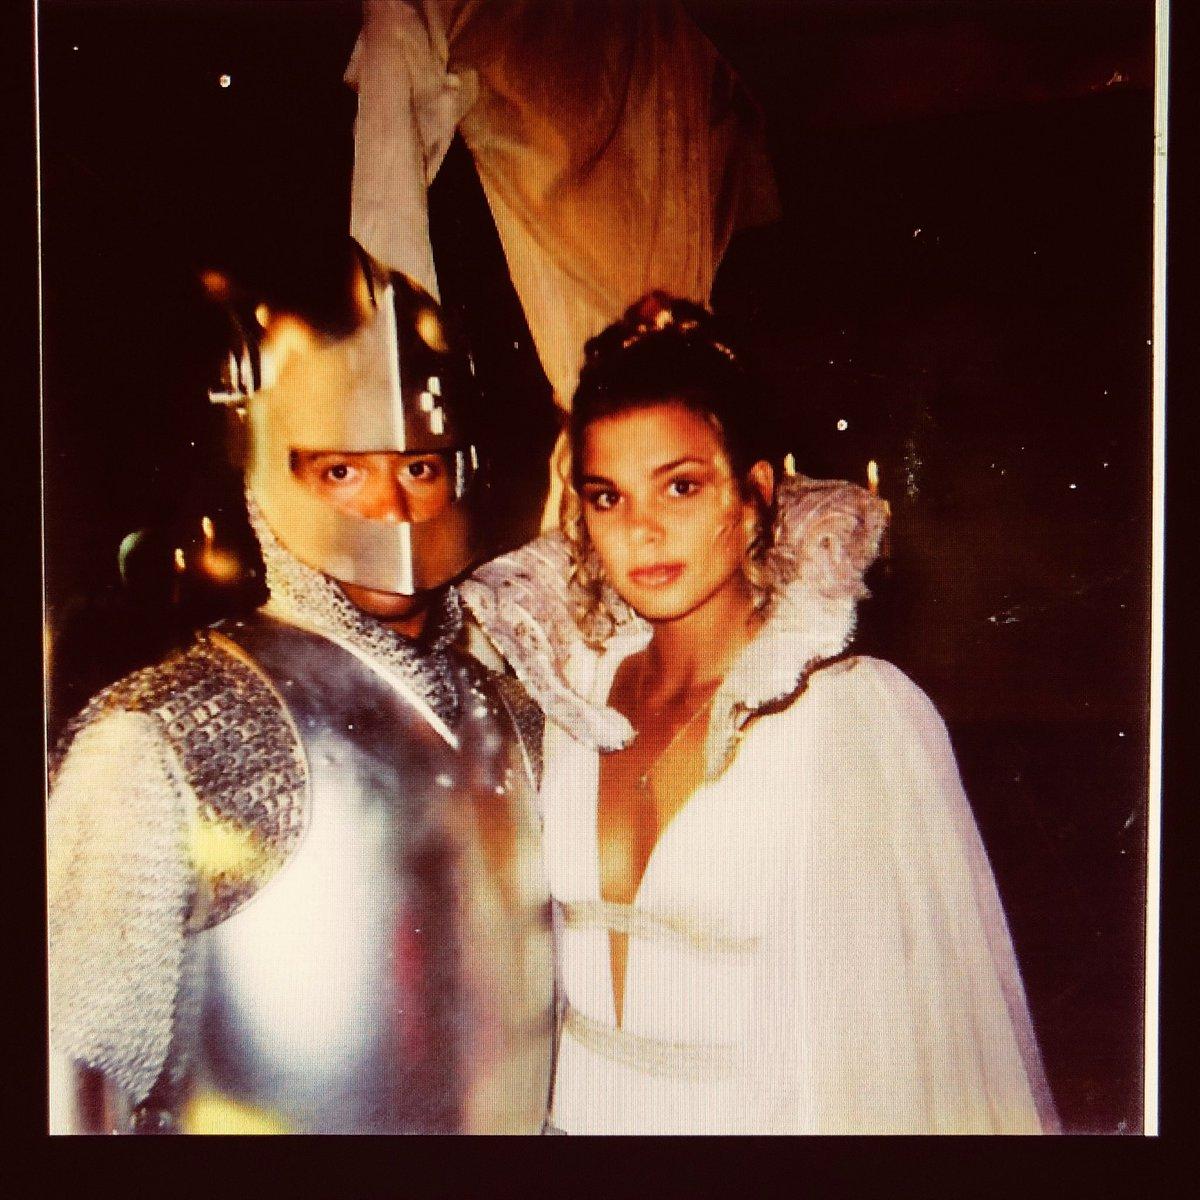 Thandie Newton (born 1972) Hot picture Attila Bertalan,Nori Dalisay (b. 1938)